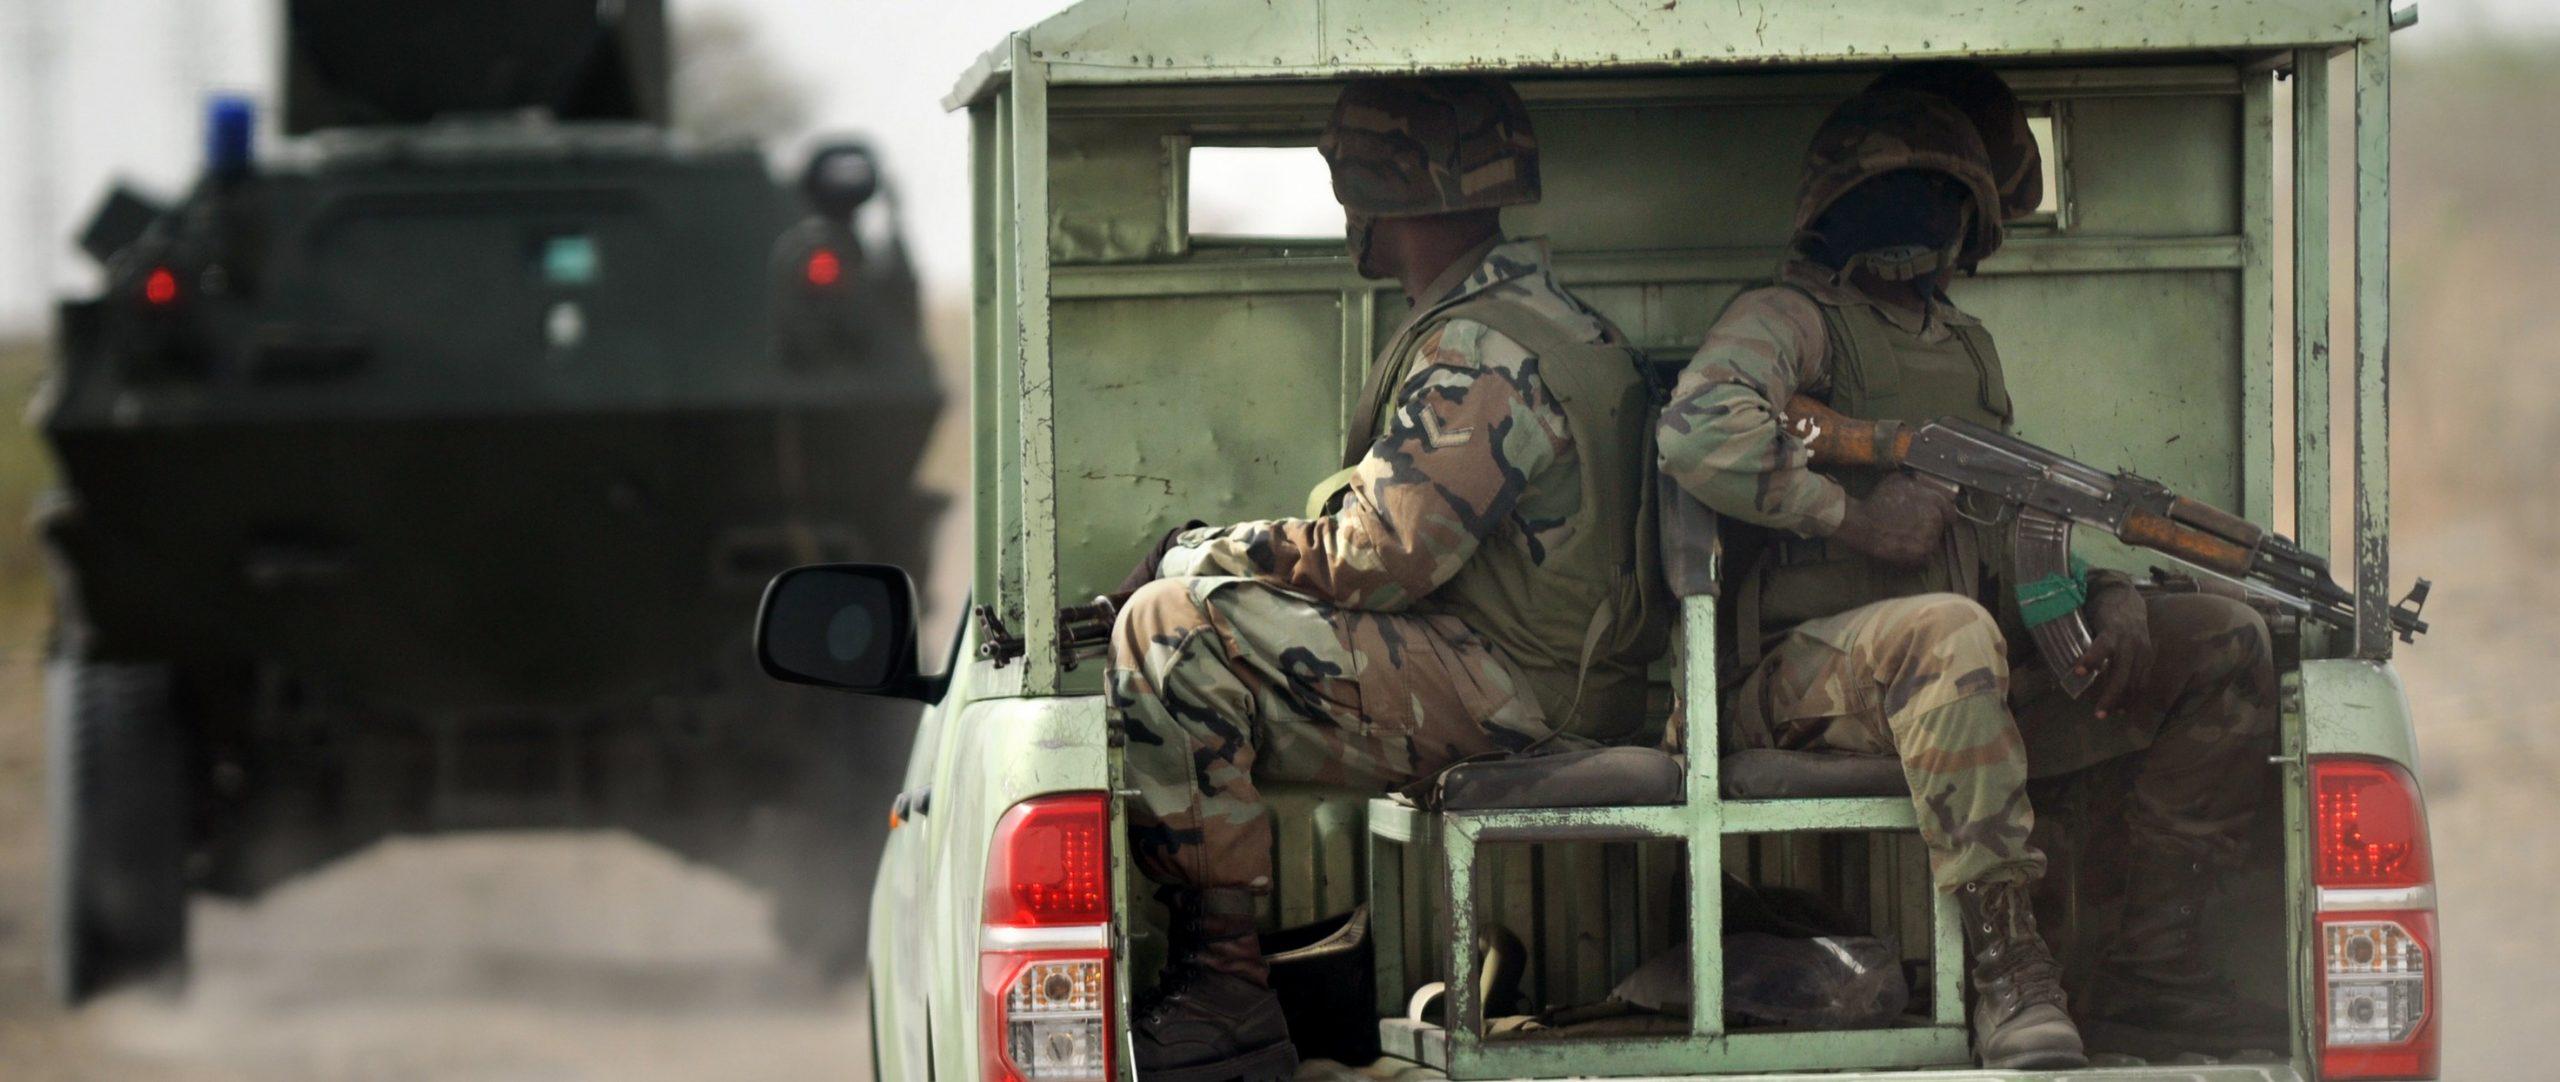 Nigeria: Military razes villages as Boko Haram attacks escalate